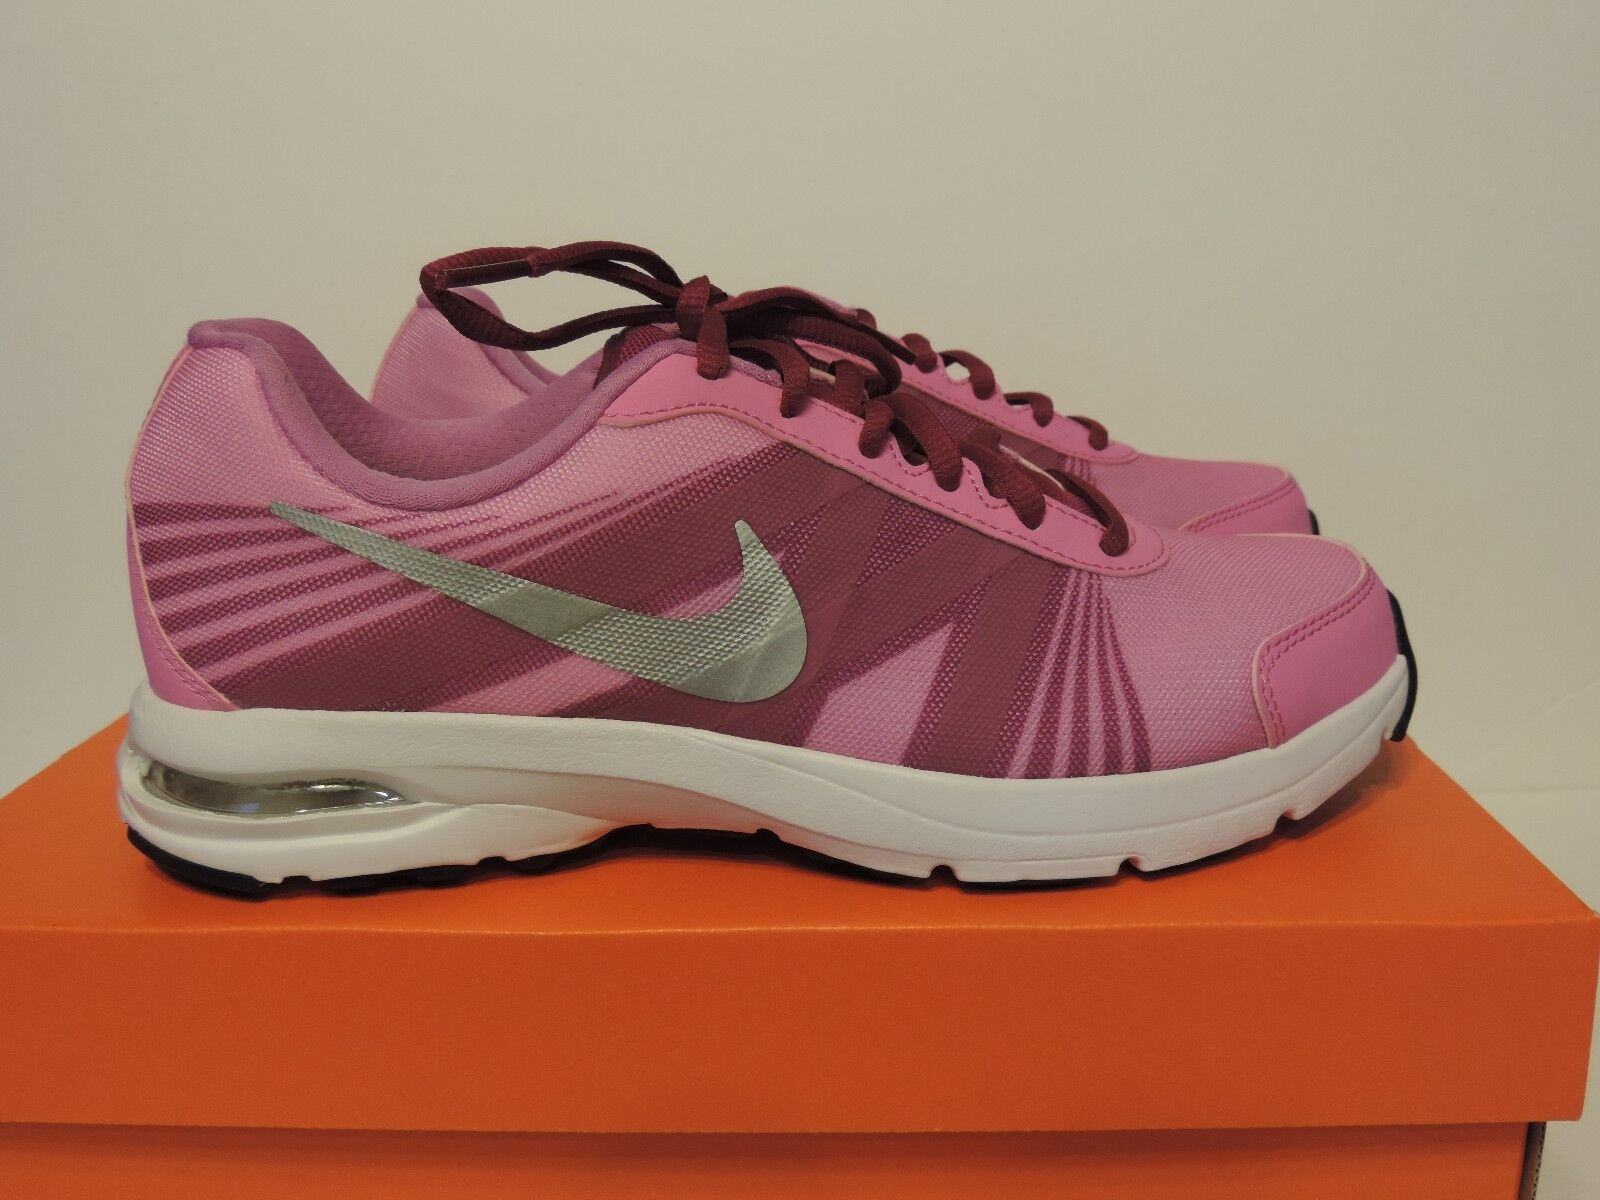 New nike Air Futurun 2 Running Shoe synthetic-and-mesh run athletic women shoes